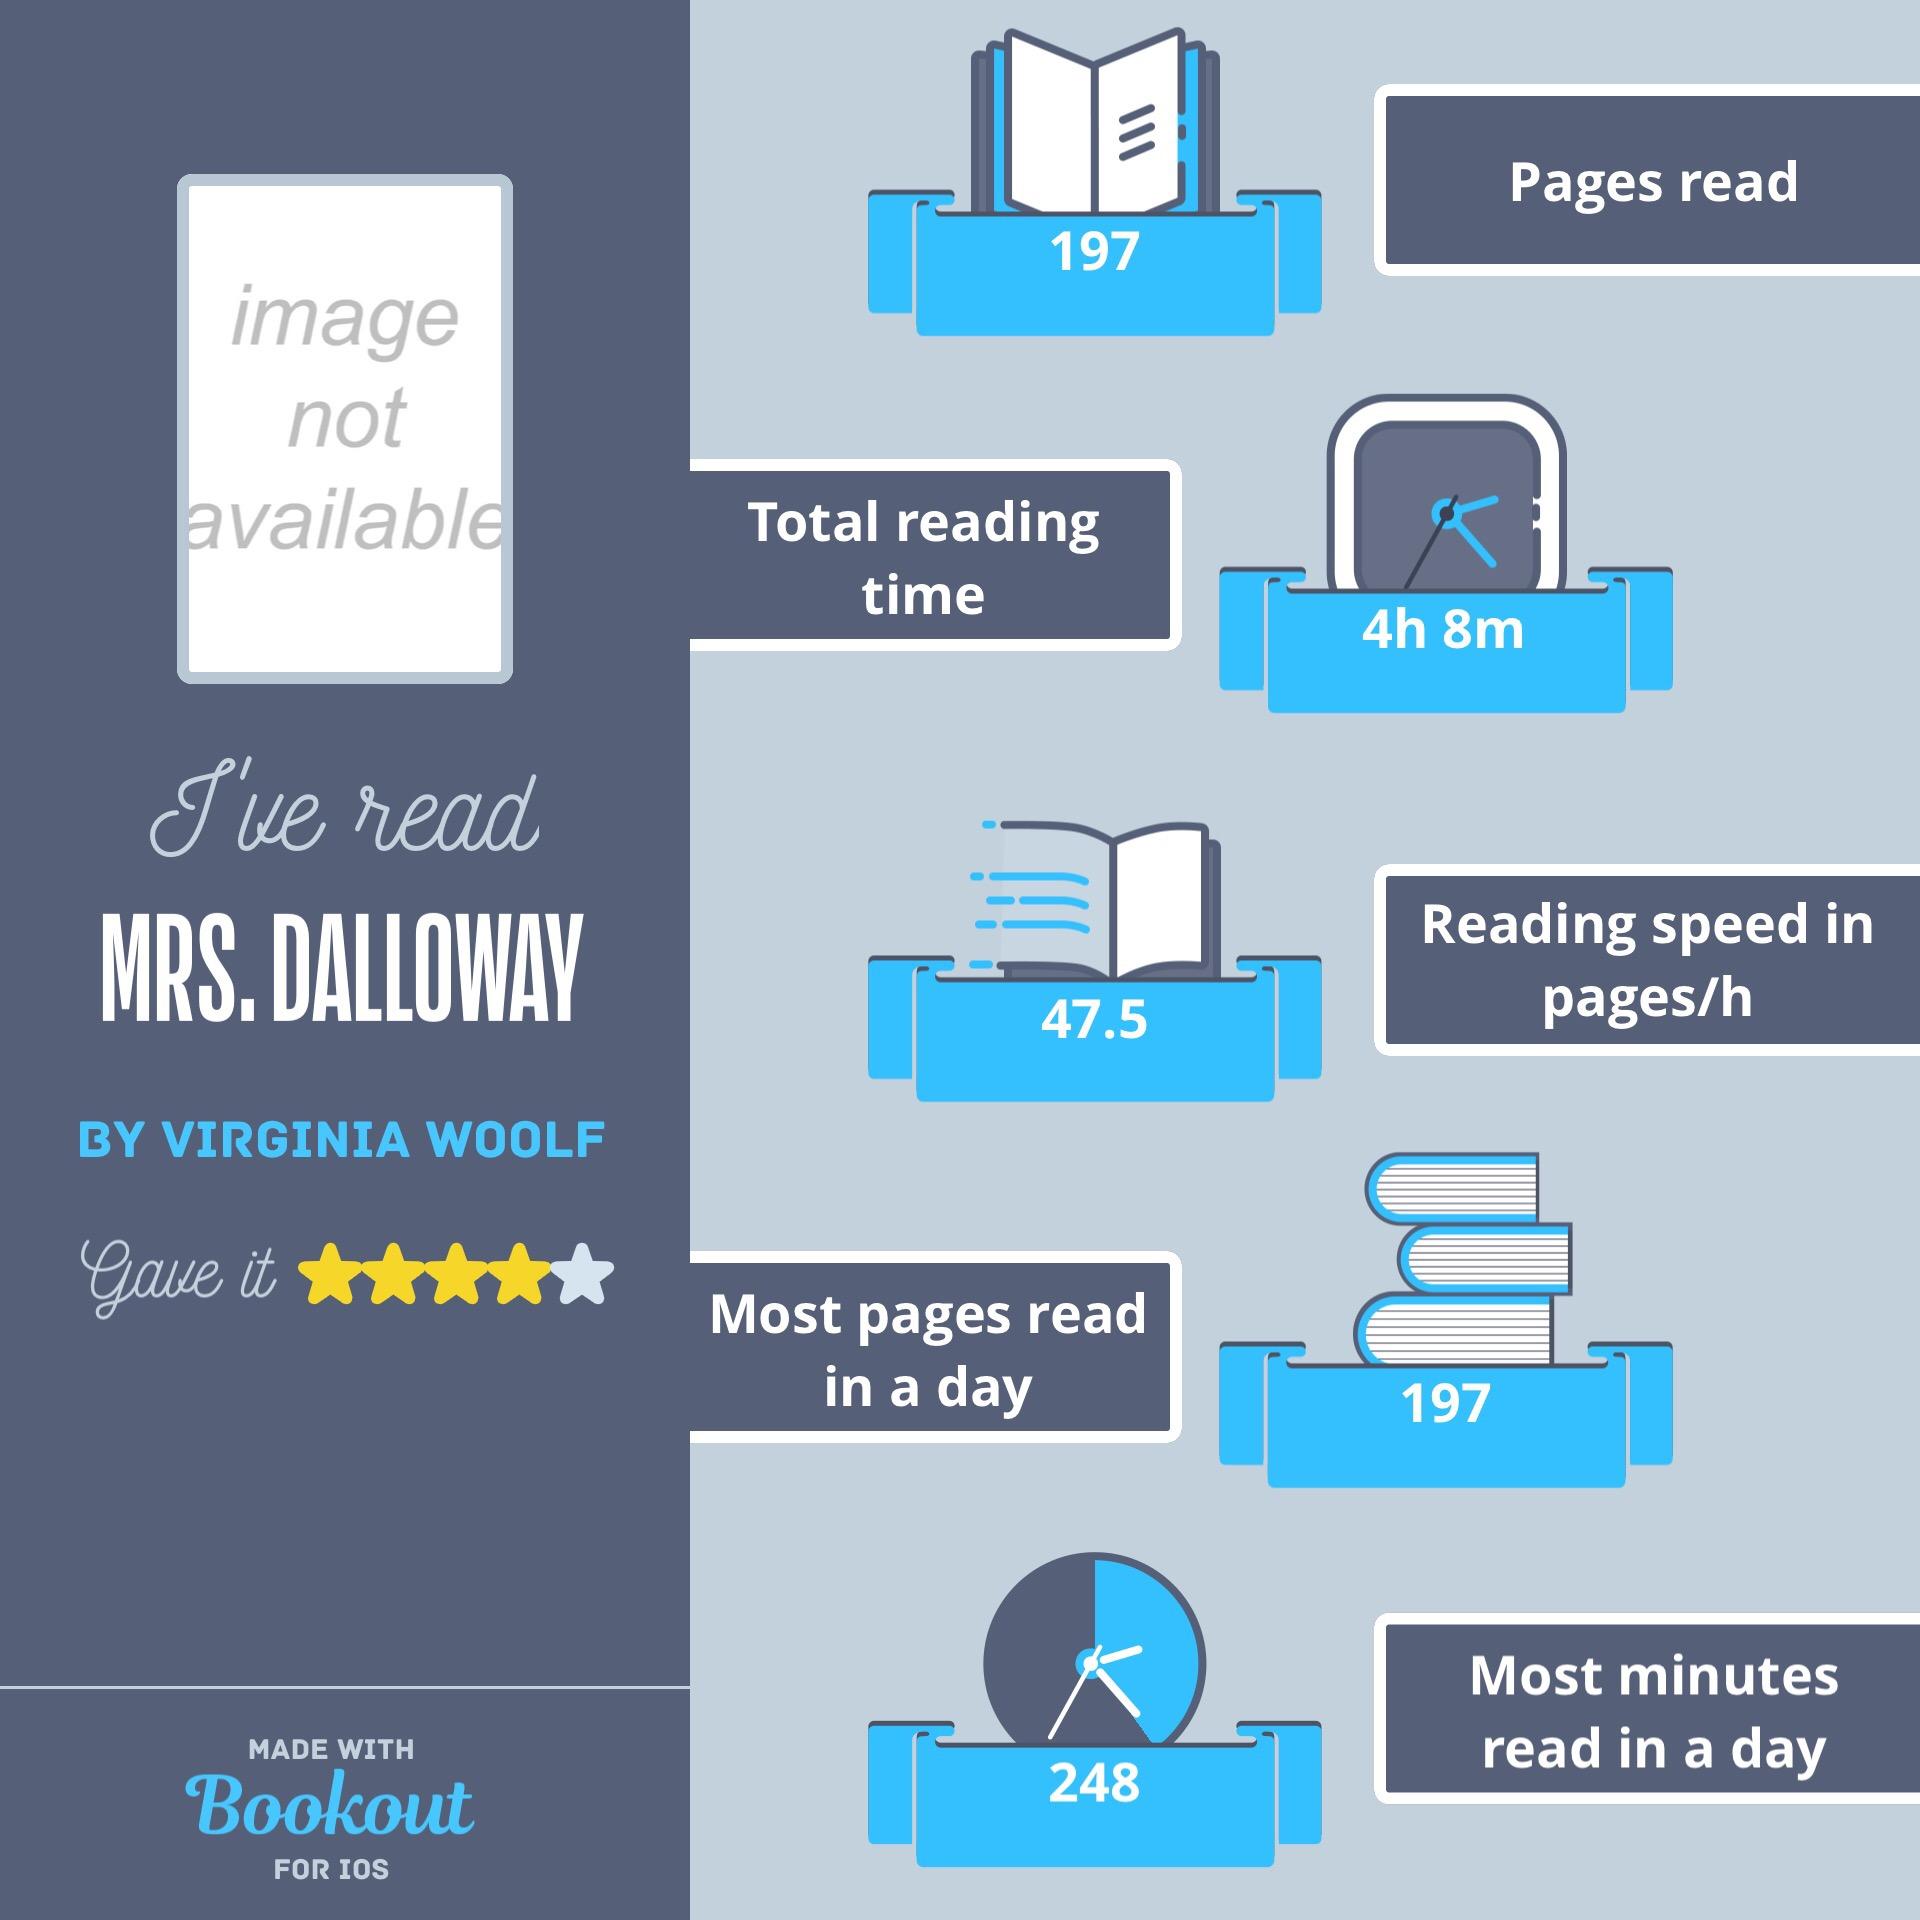 mrs dalloway readathon.jpg